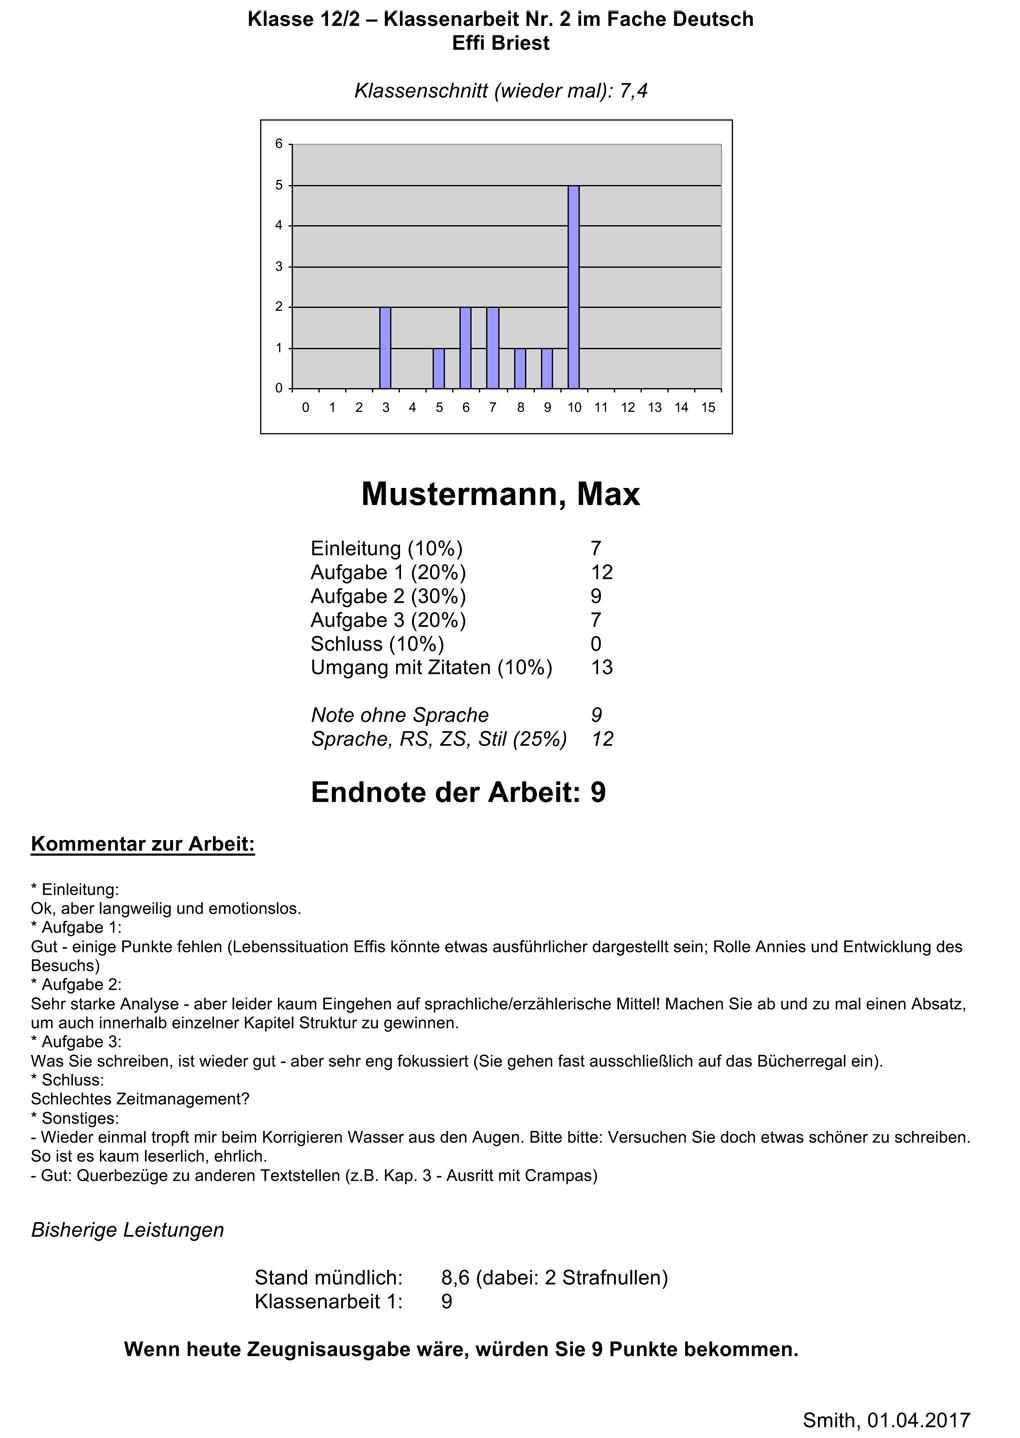 Rückmeldung zu Klassenarbeit + Leistungsstand mit ...